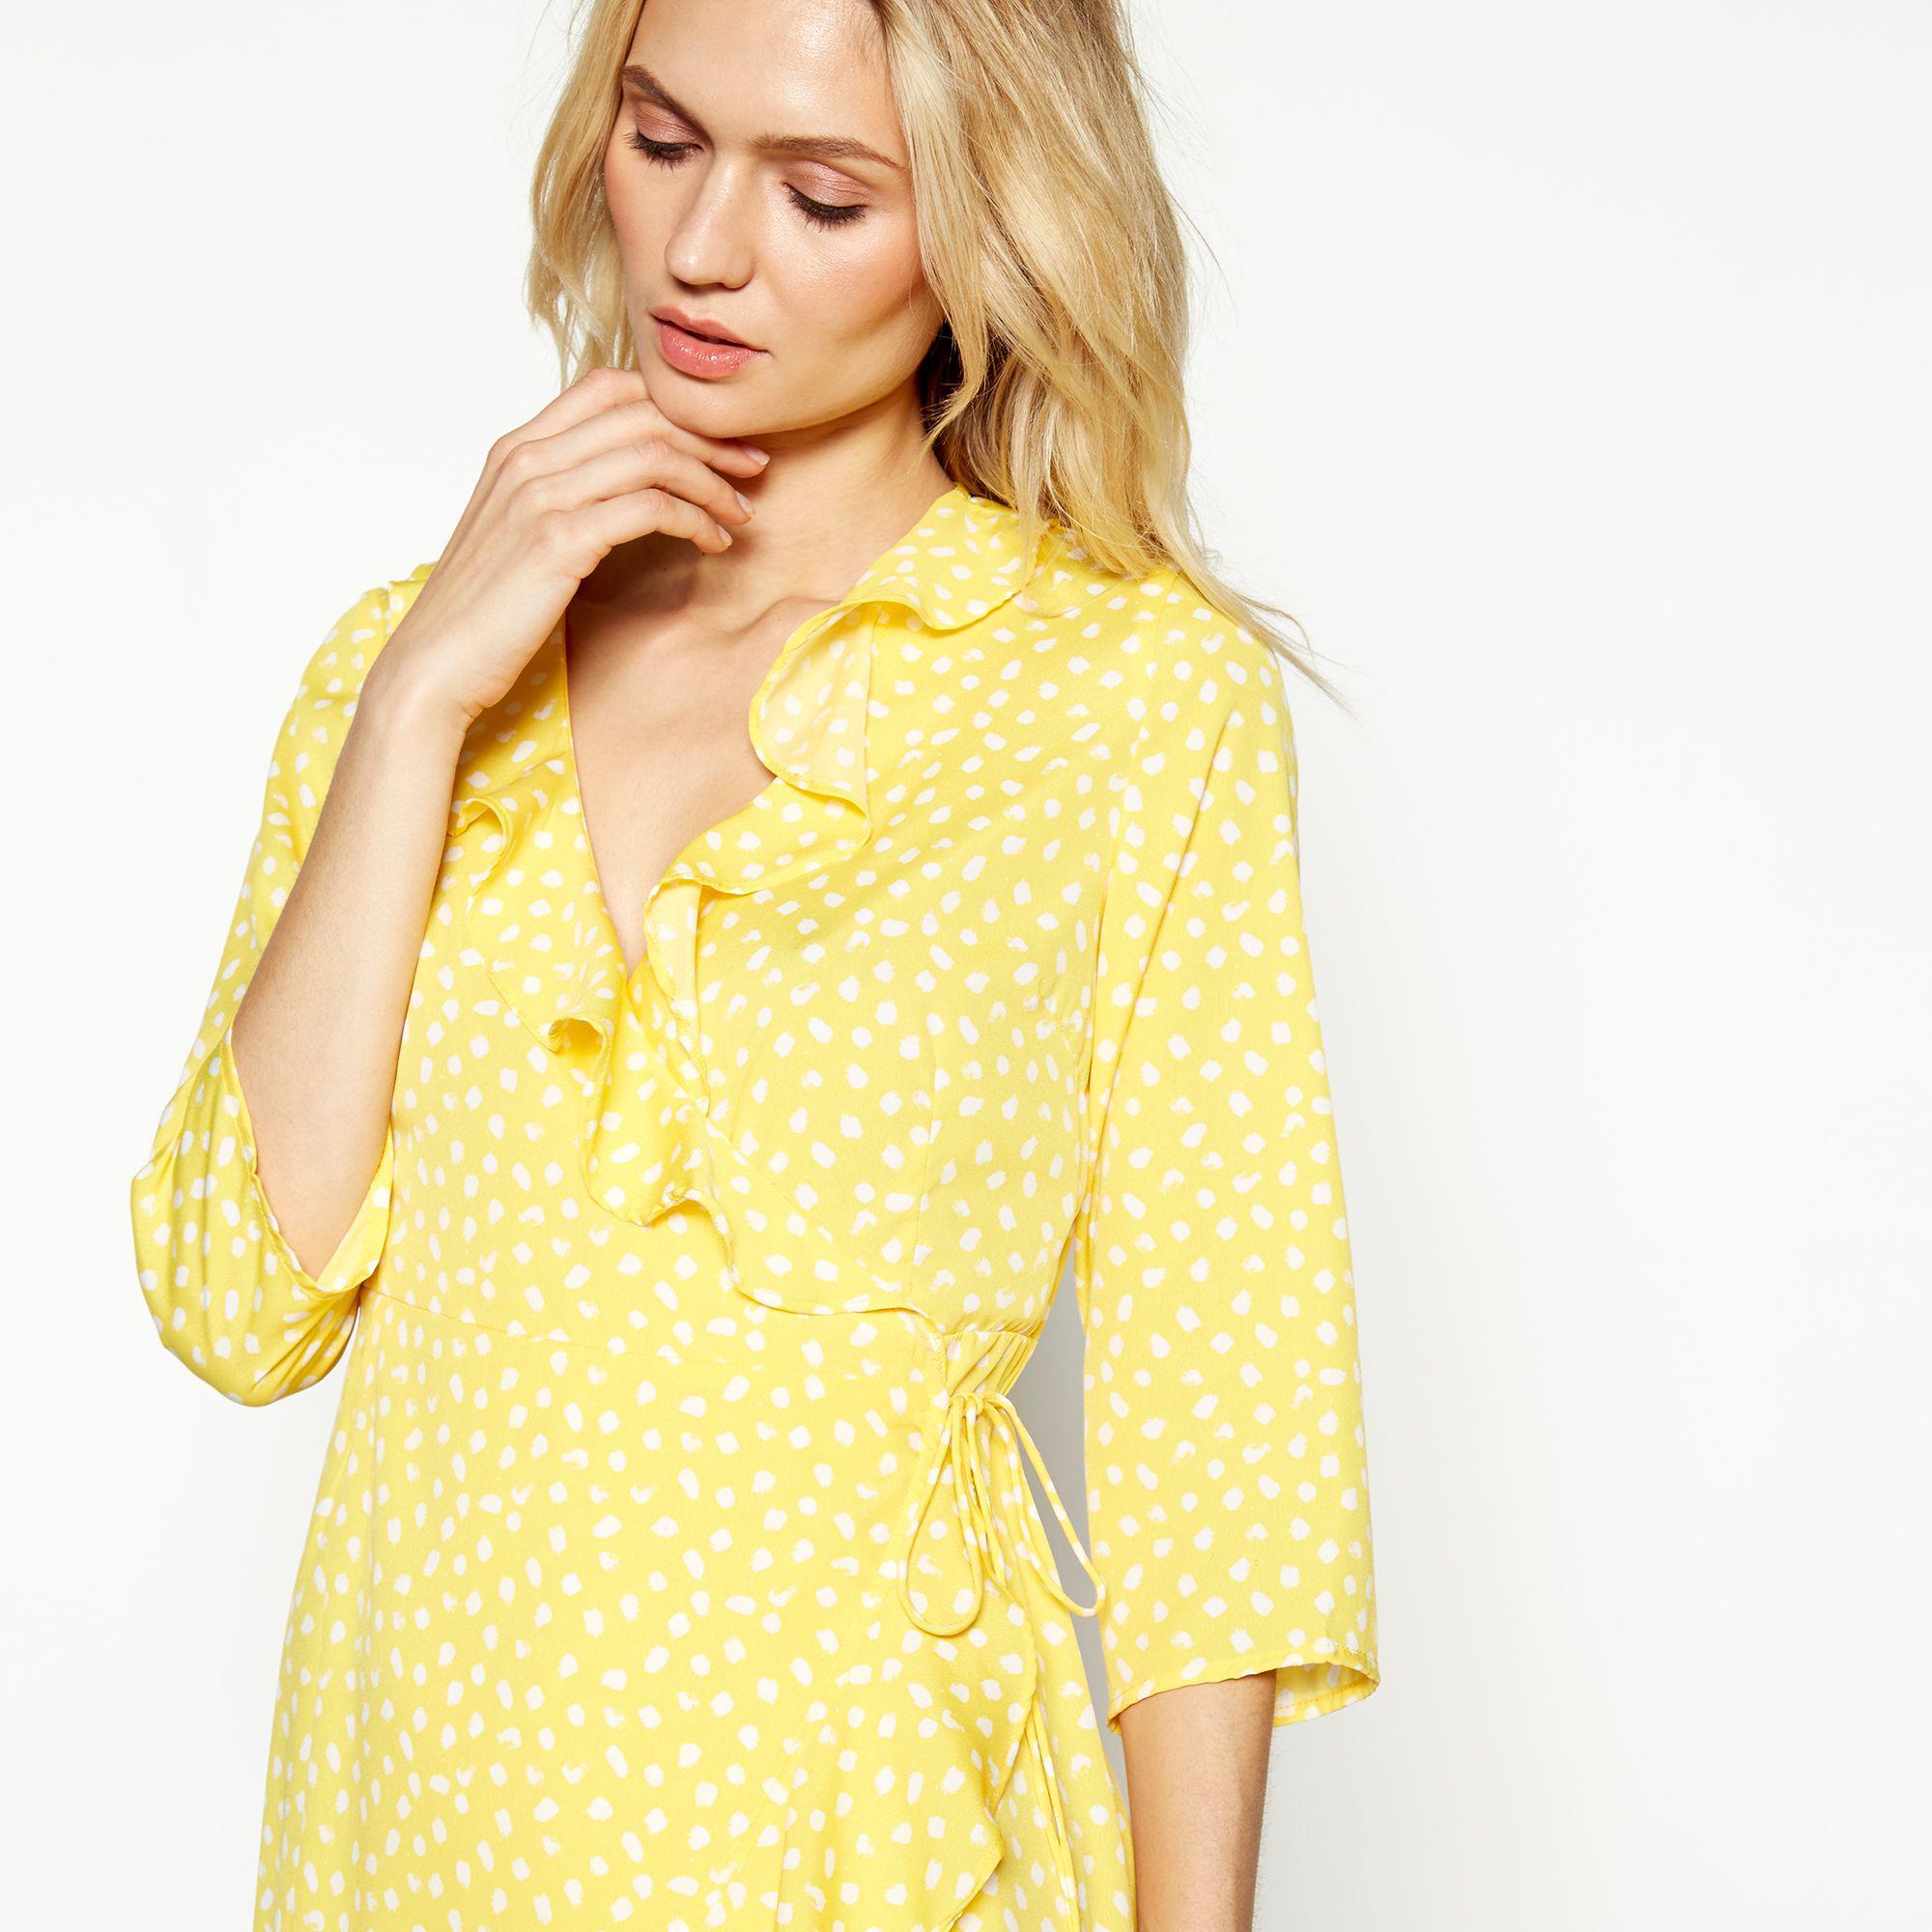 b1961dce Vero Moda Yellow Spot Print 'henna' V-neck 3/4 Length Sleeve Wrap ...